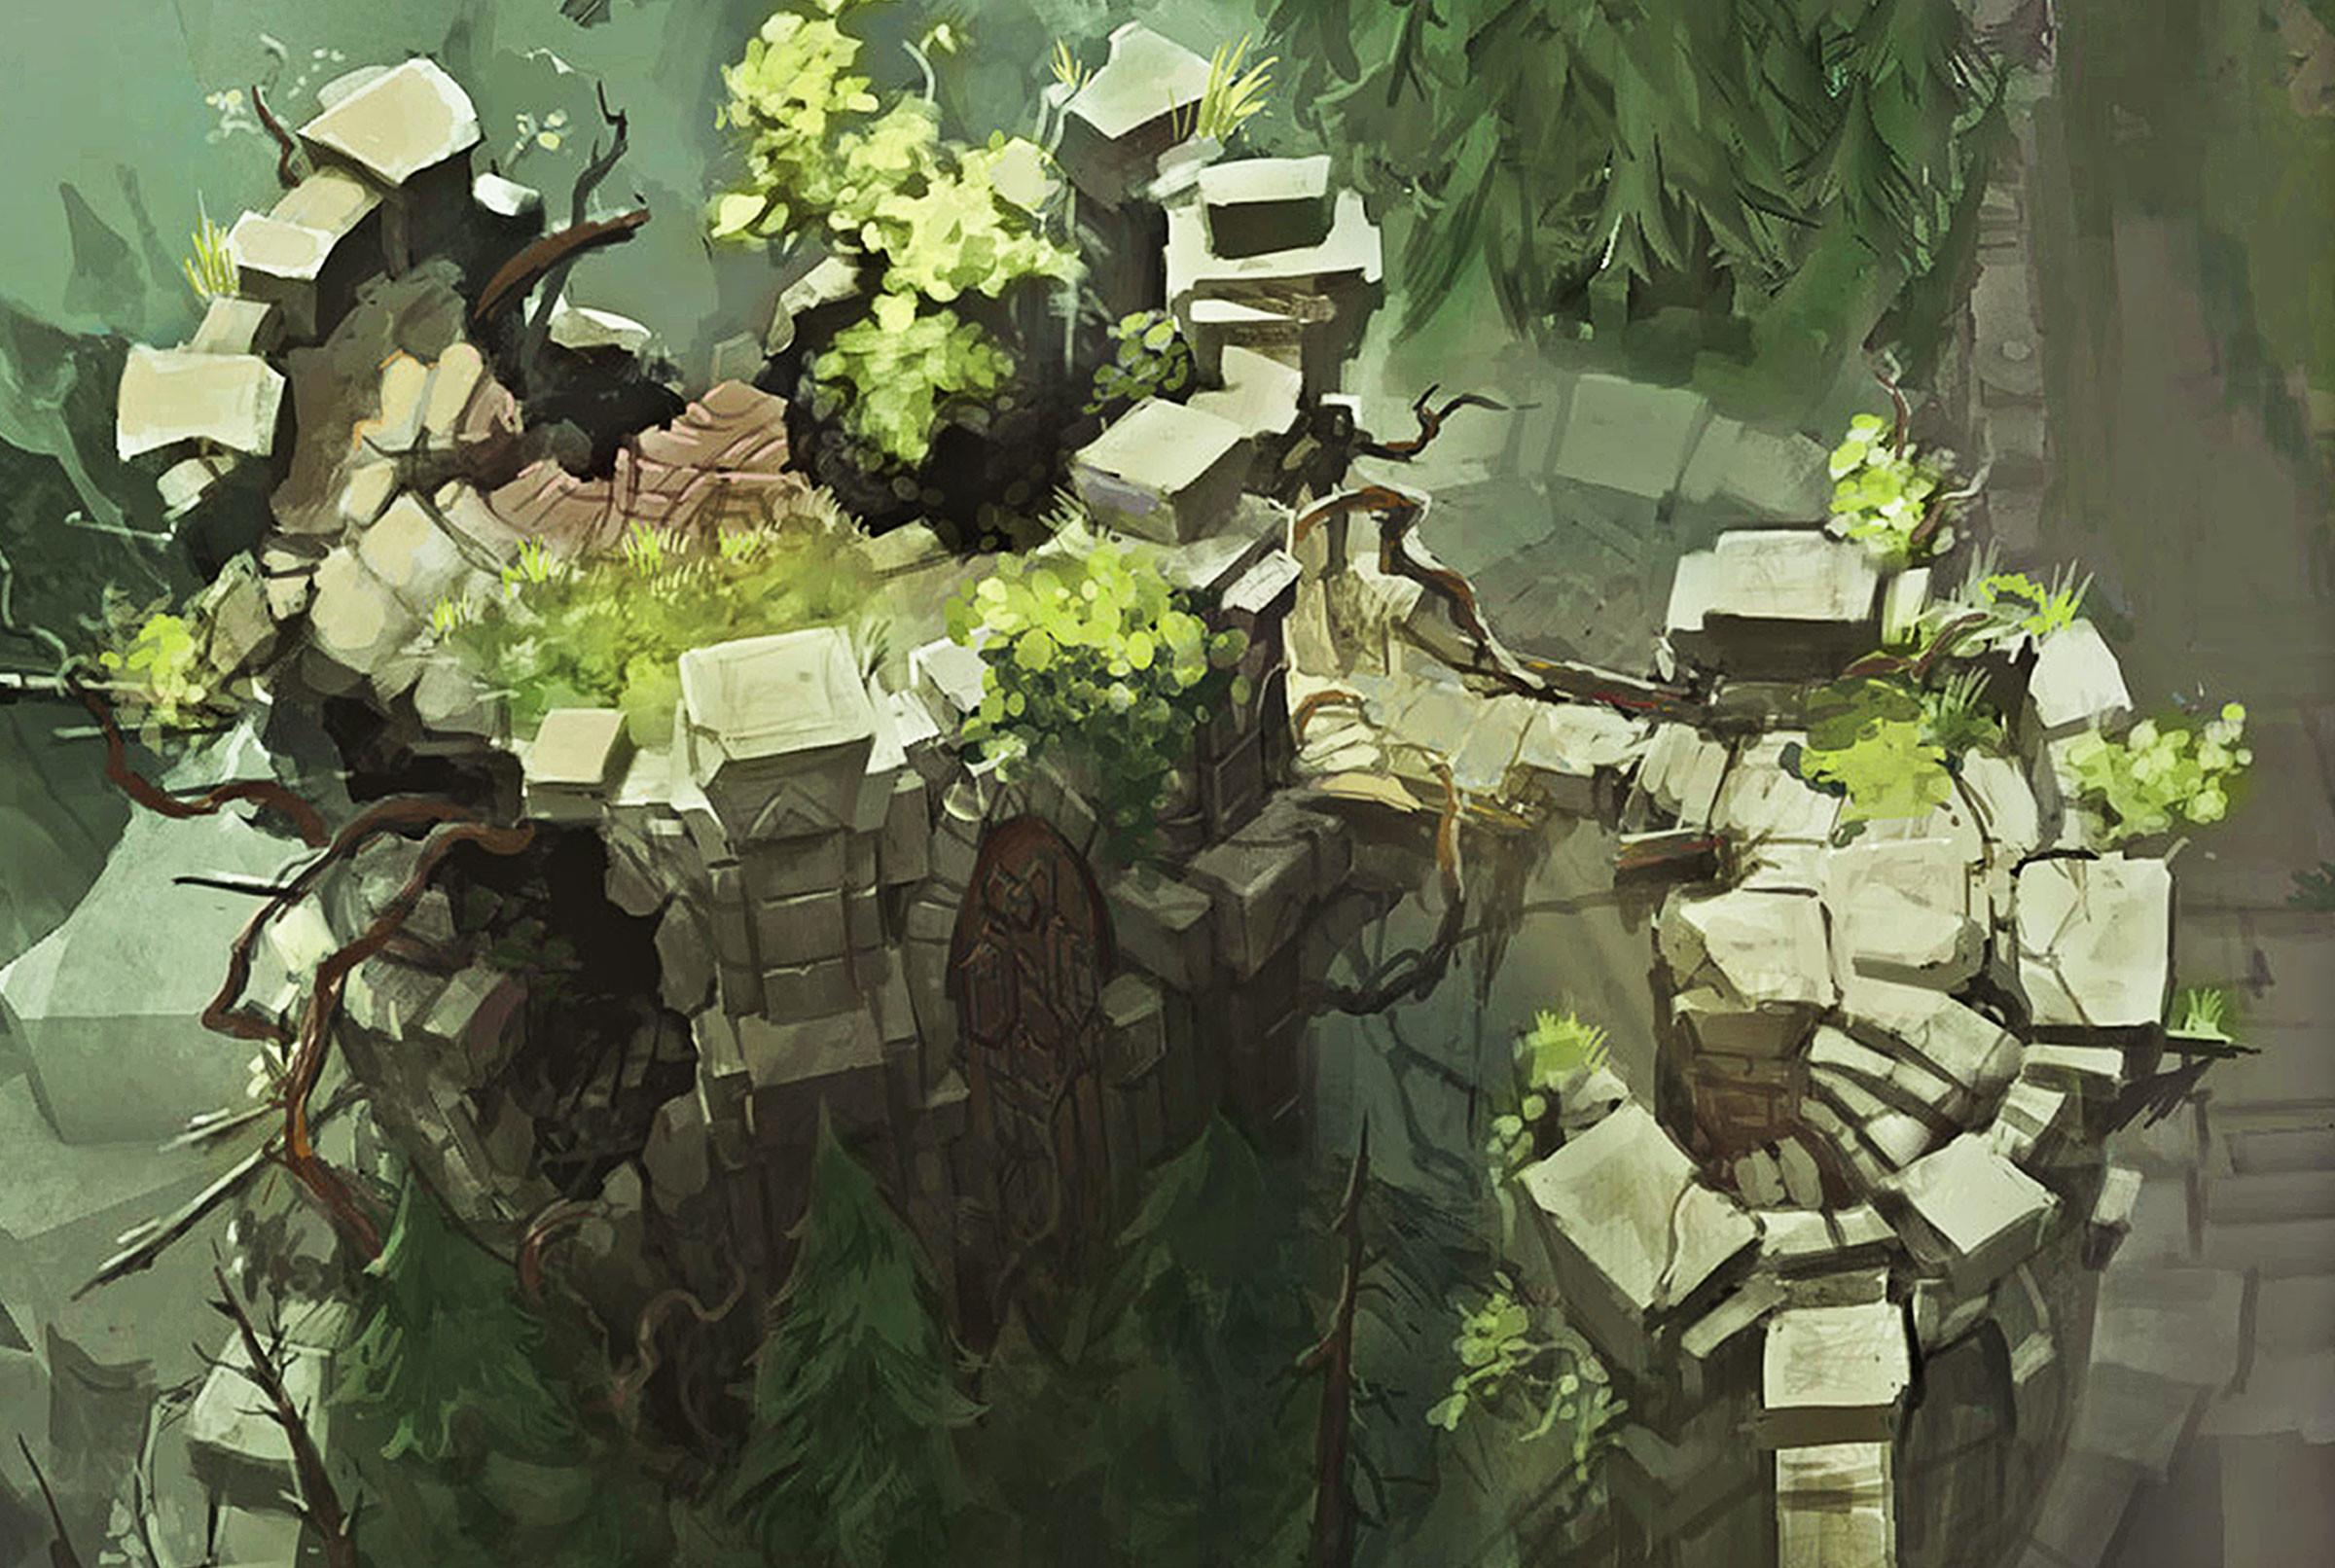 Summoners Rift Concept (2) League of Legends Artwork Wallpaper lol